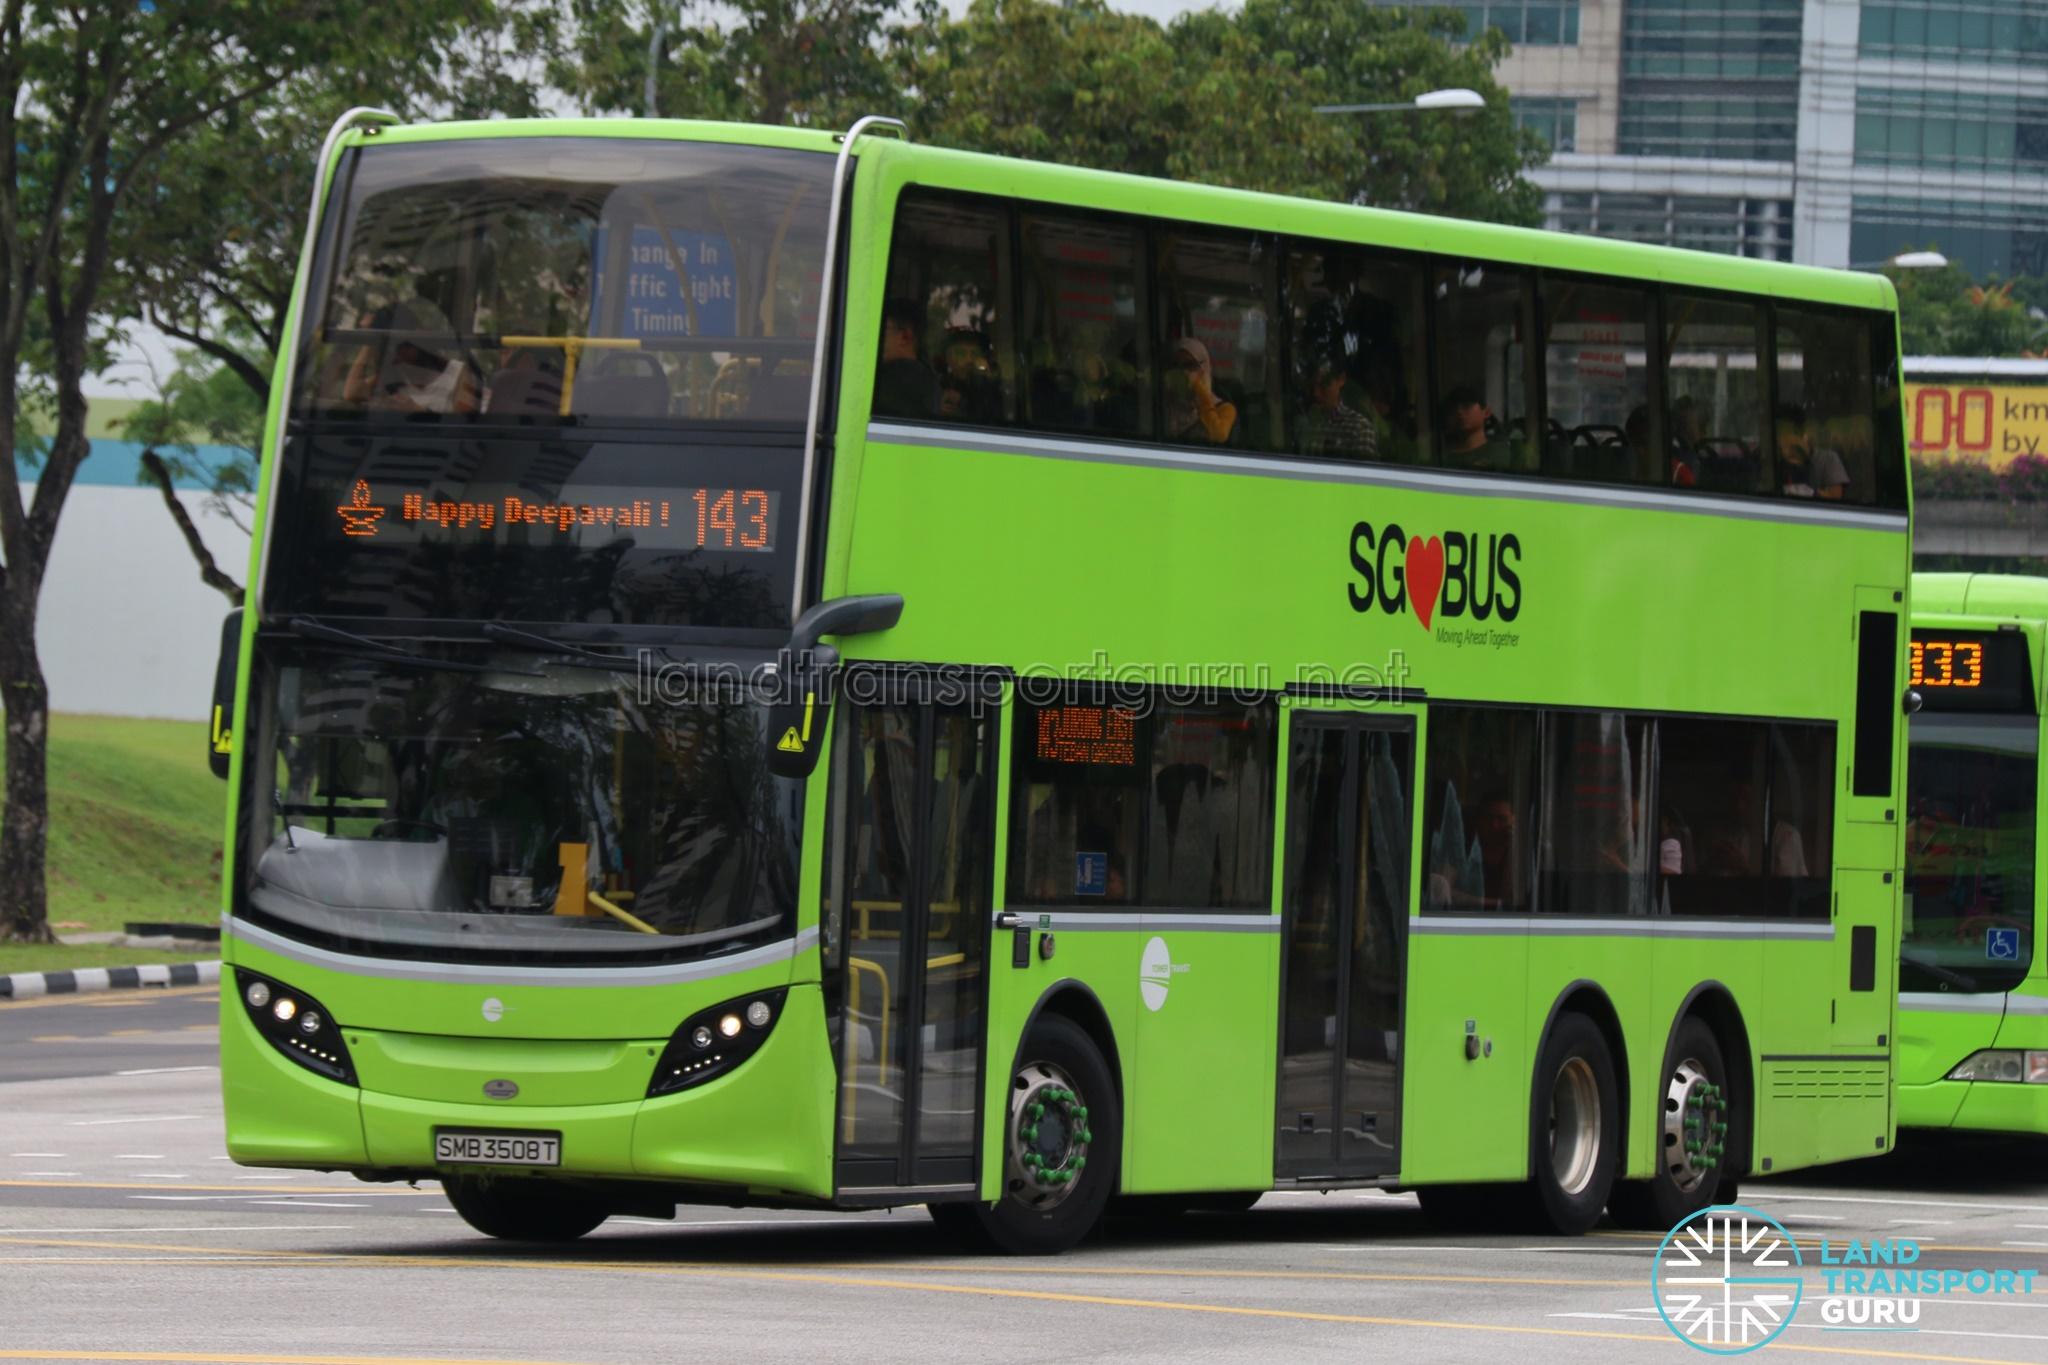 Tower Transit Alexander Dennis Enviro500 (SMB3508T) - Service 143 Happy Deepavali